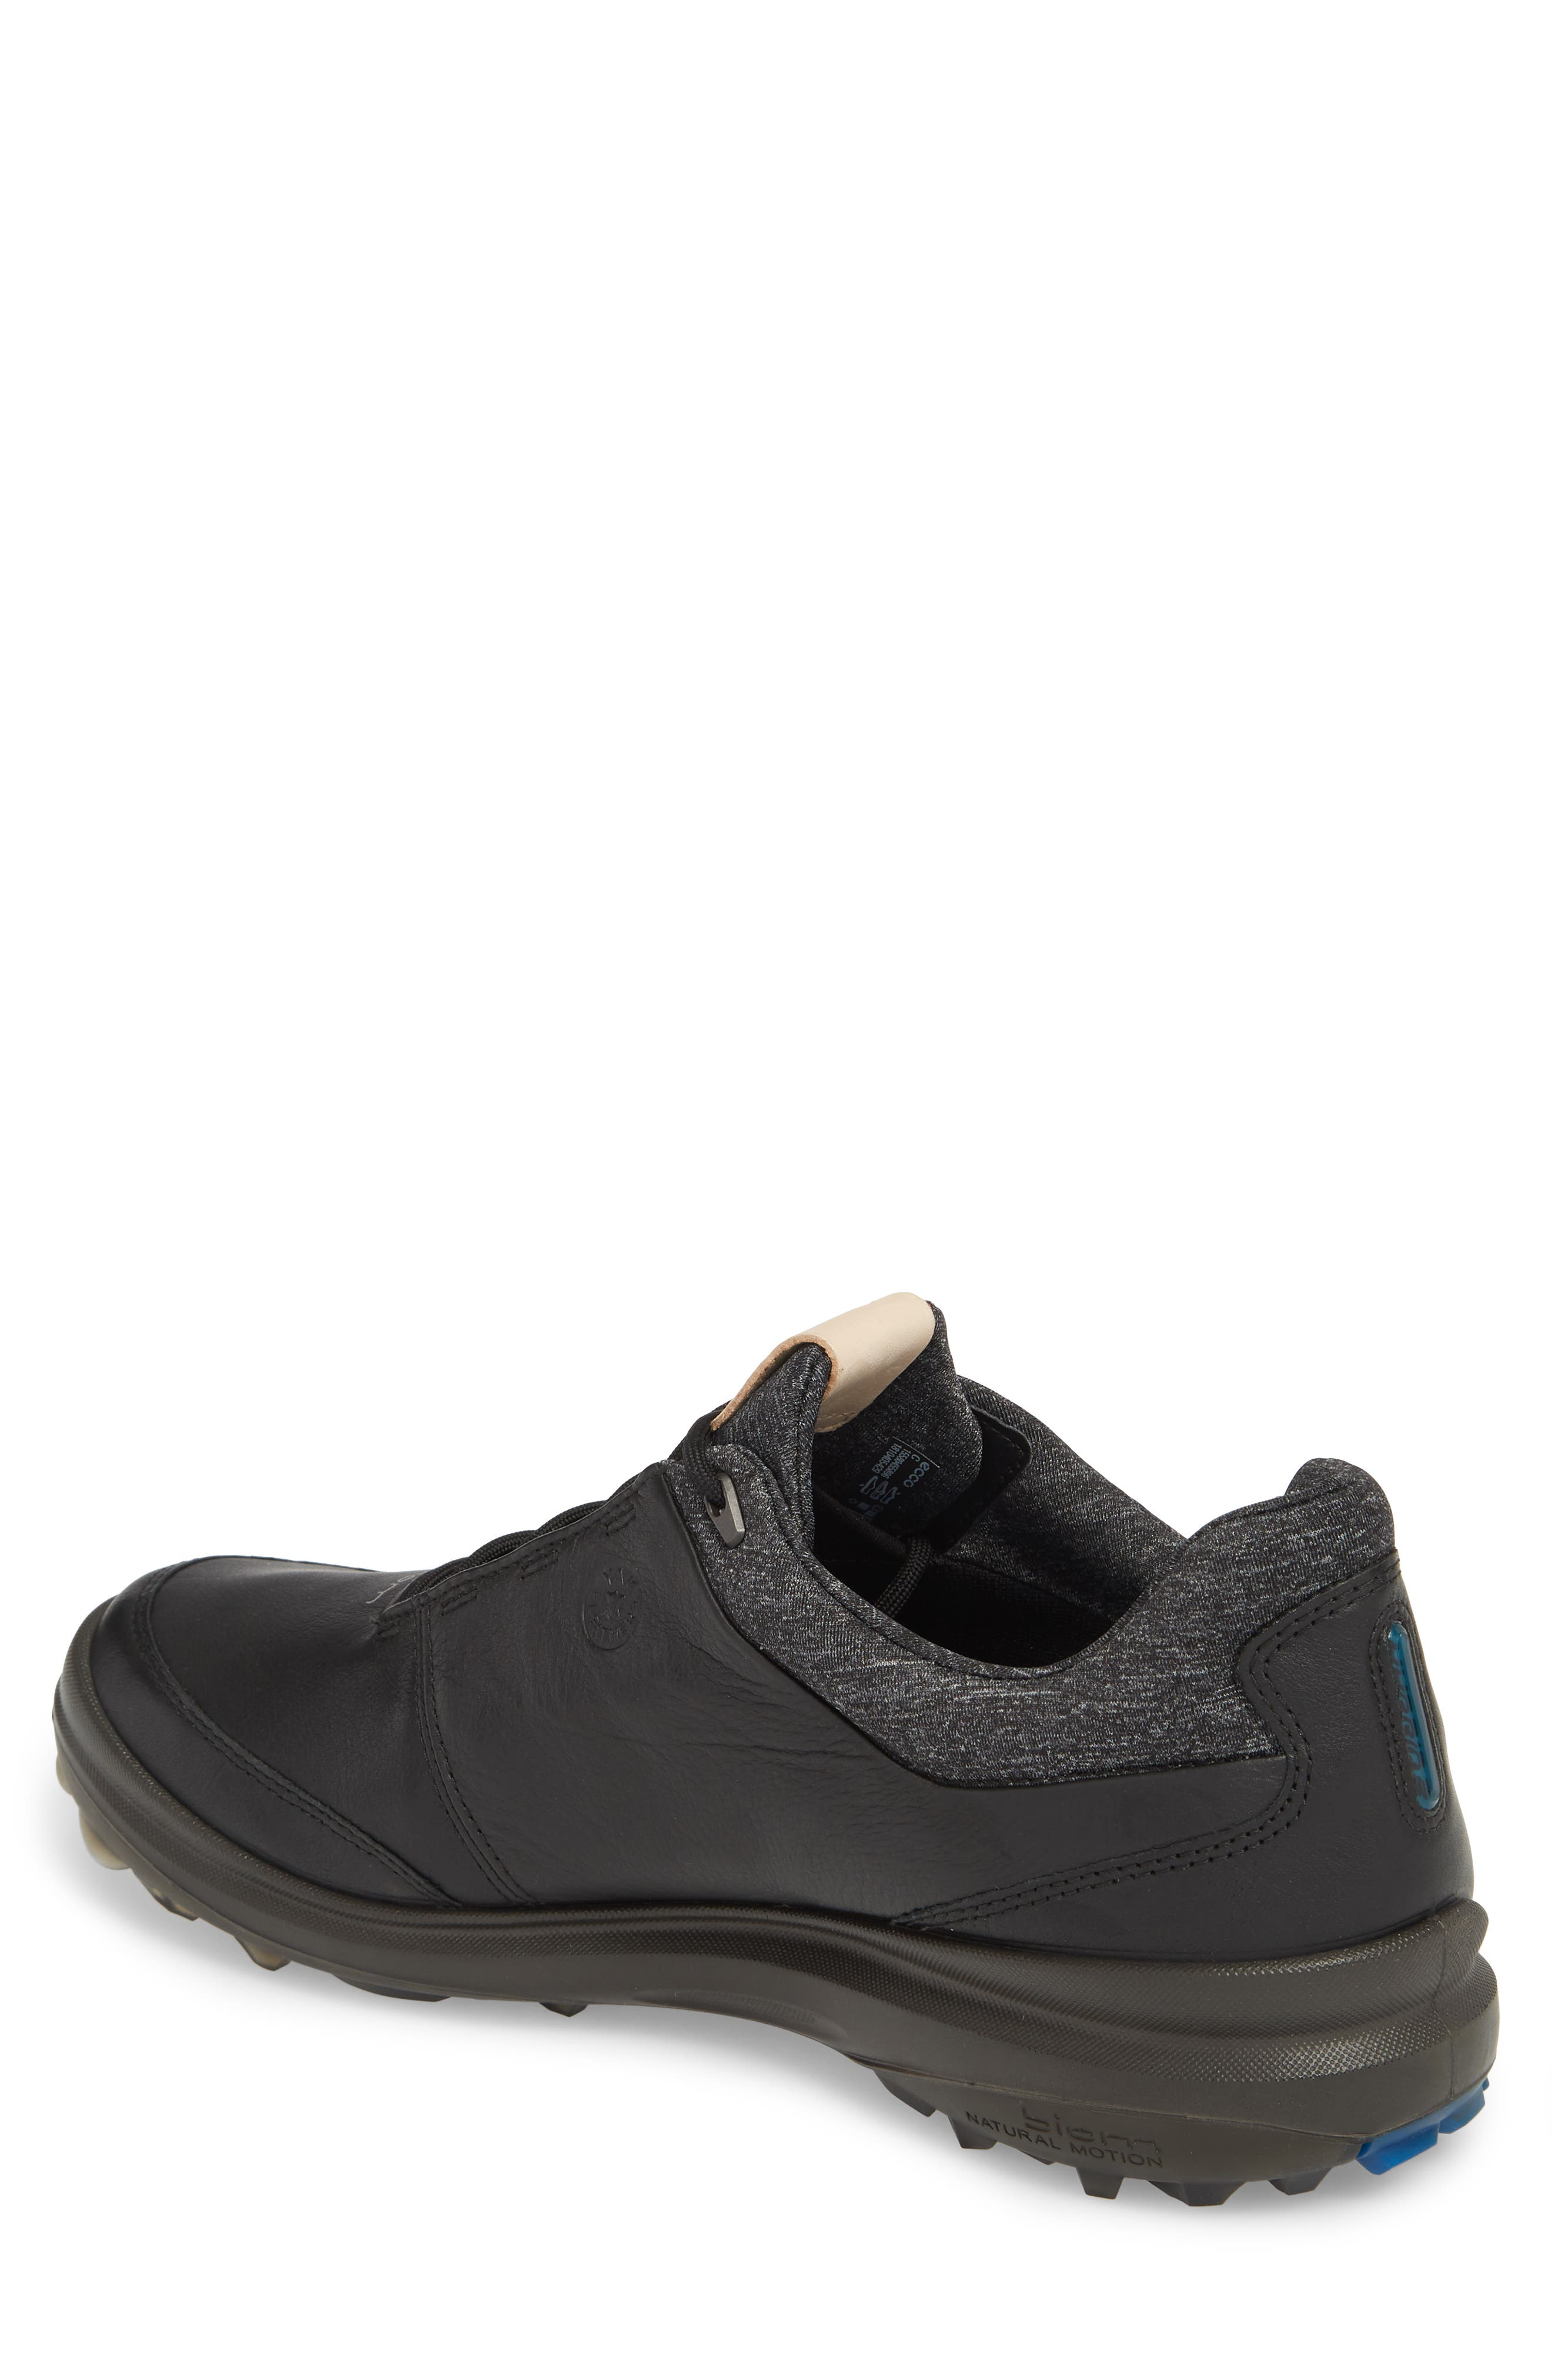 ECCO, BIOM Hybrid 3 Gore-Tex<sup>®</sup> Golf Shoe, Alternate thumbnail 2, color, BLACK/ BERMUDA BLUE LEATHER